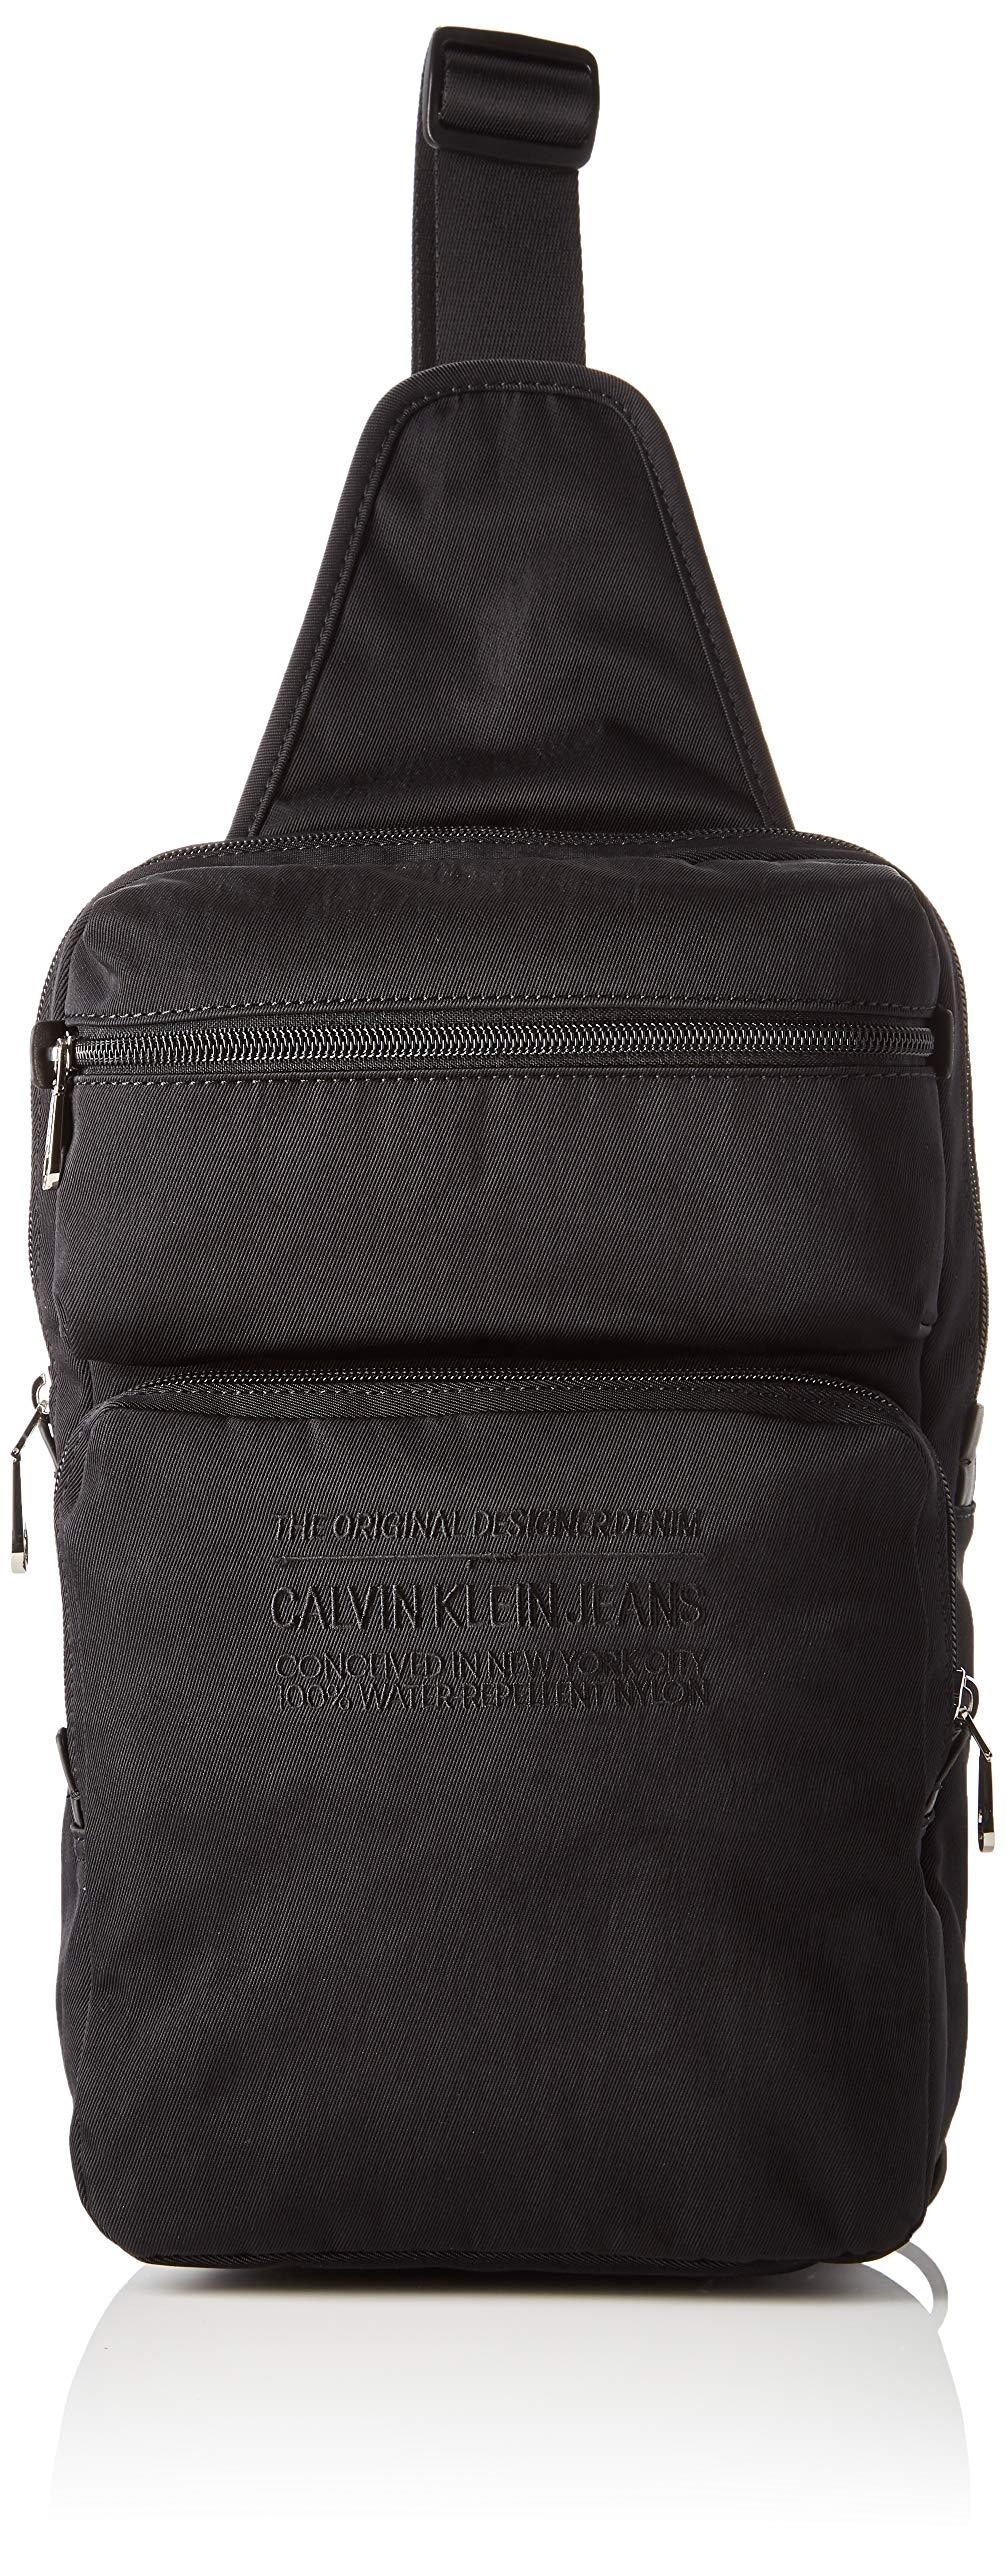 Calvin Klein NYLON UTILITY 2 PKT SLINGHombreShoppers y bolsos de hombroNegro (Black) 9.5x32x20 centimeters (B x H x T)